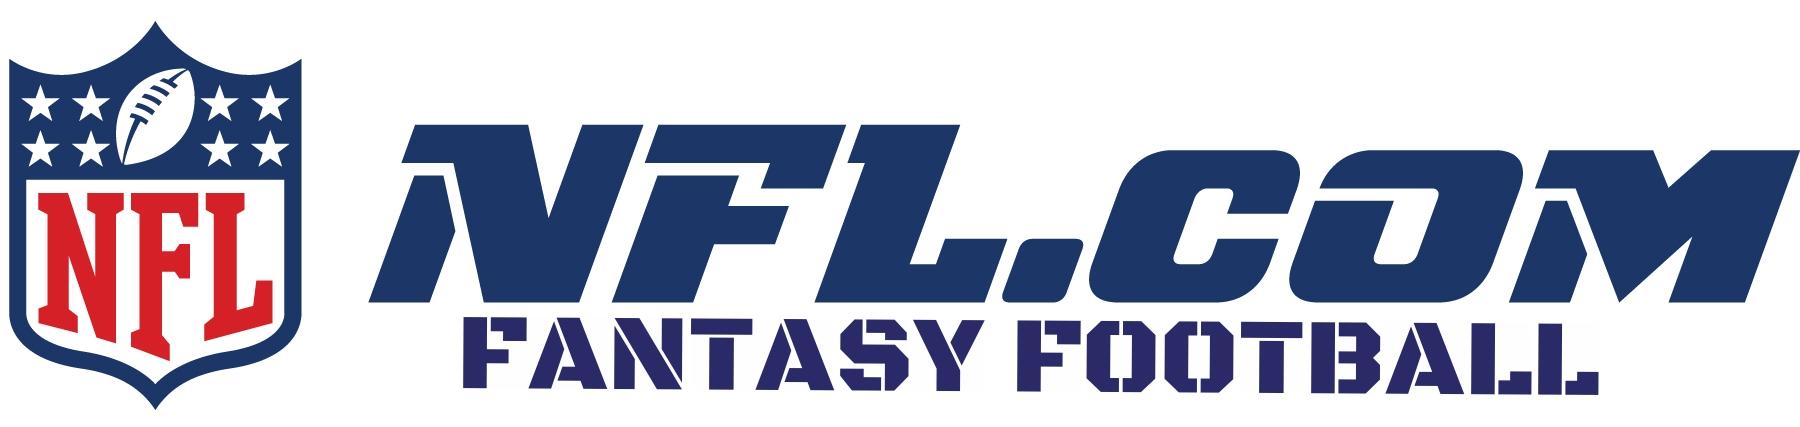 NFL.com archive